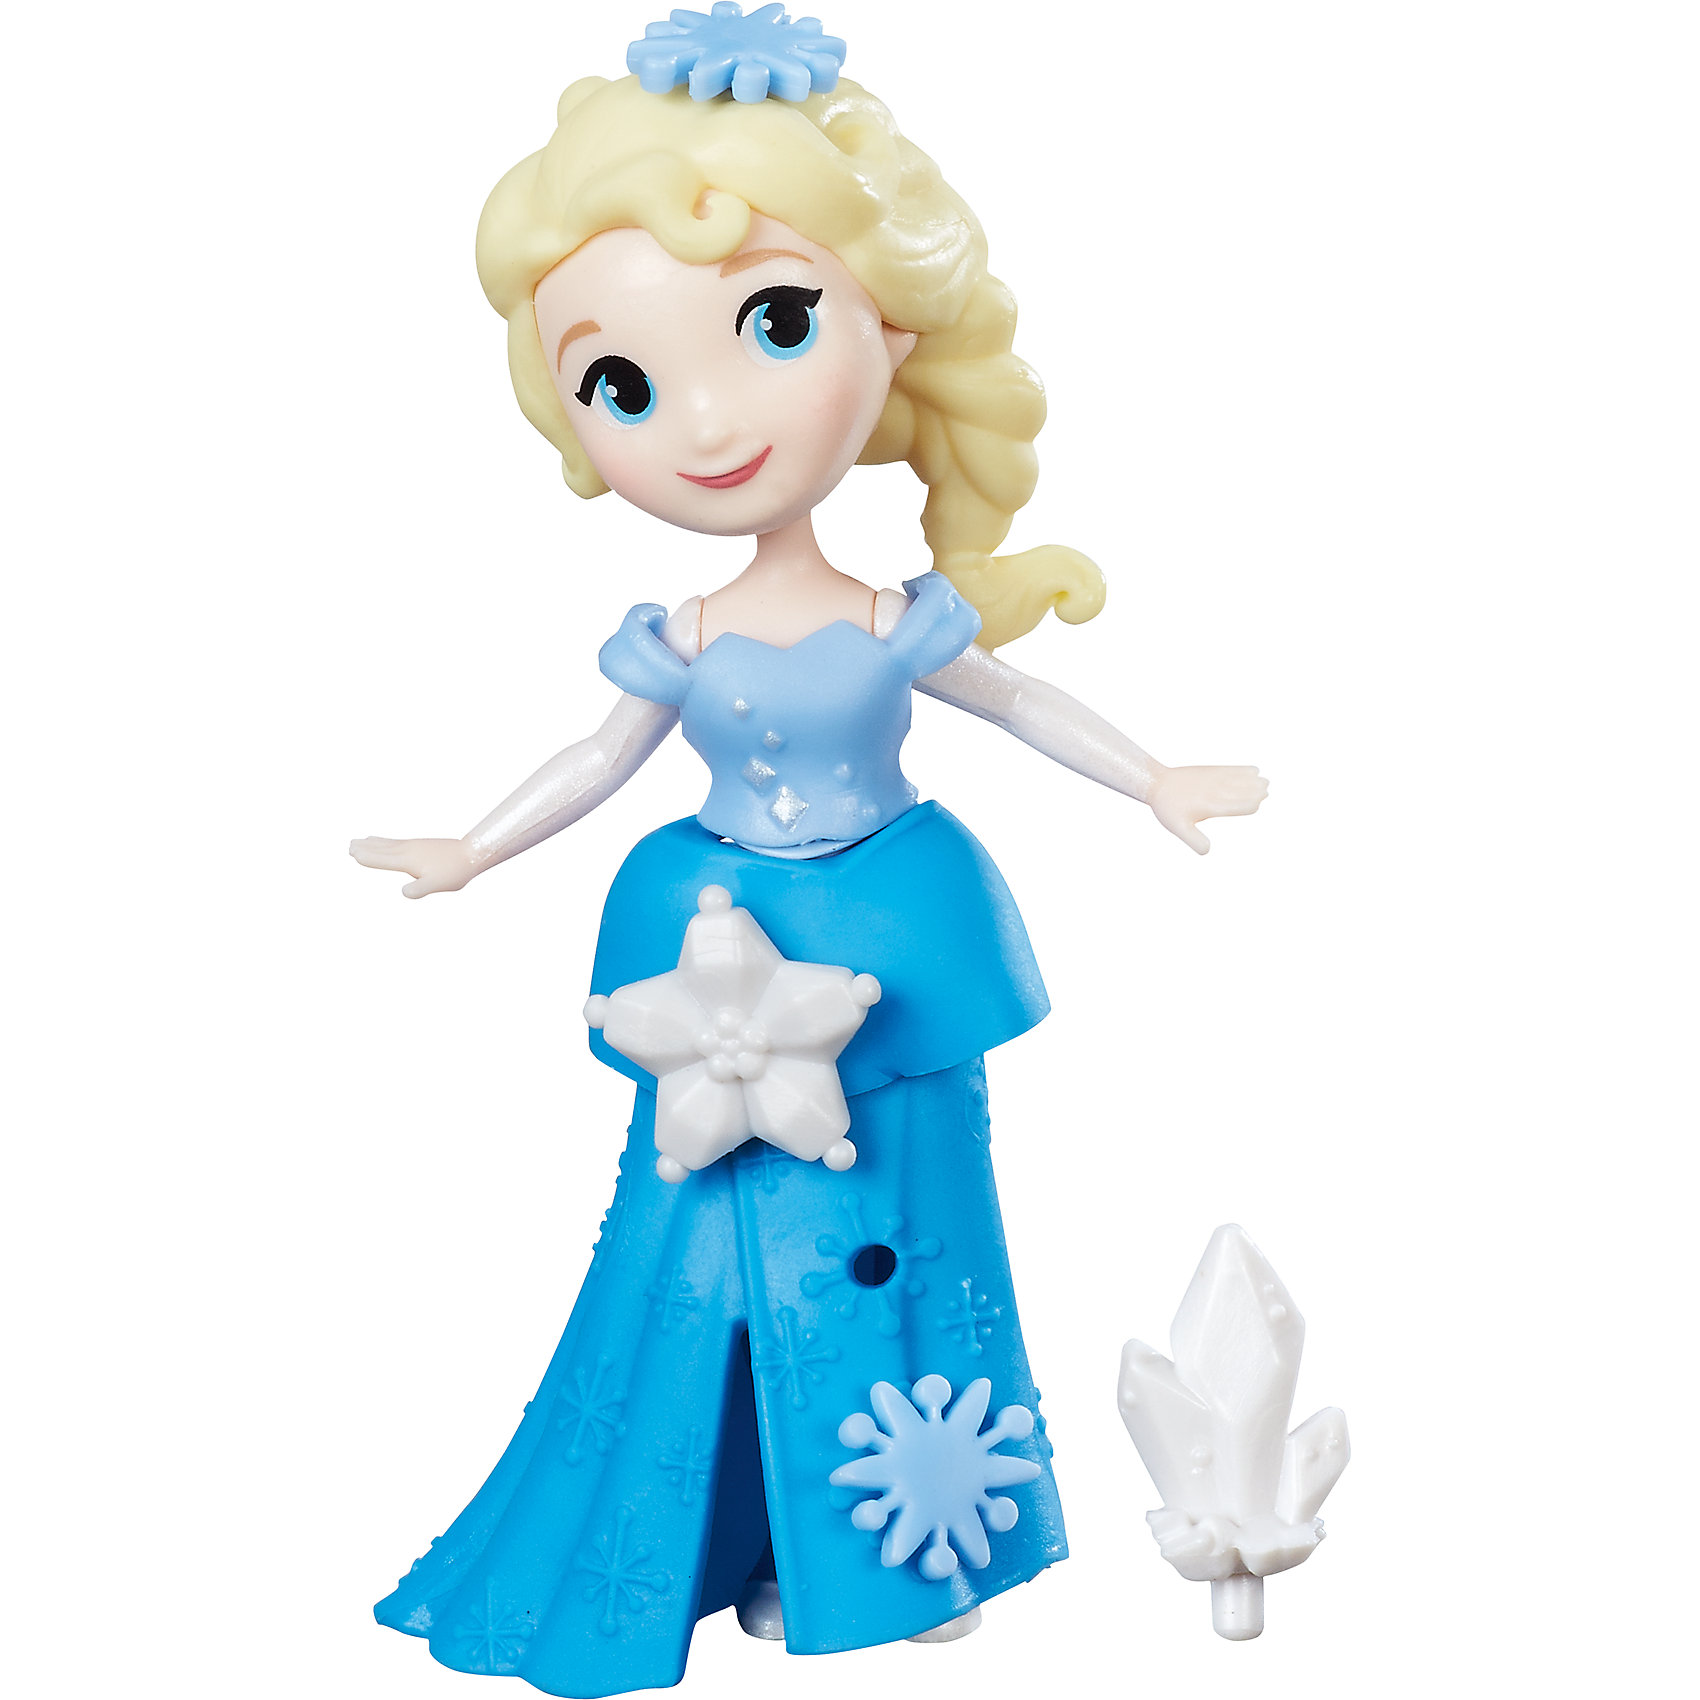 Hasbro Маленькая кукла Холодное сердце, C1096/C1099 hasbro набор кукол холодное сердце анна и кристоф